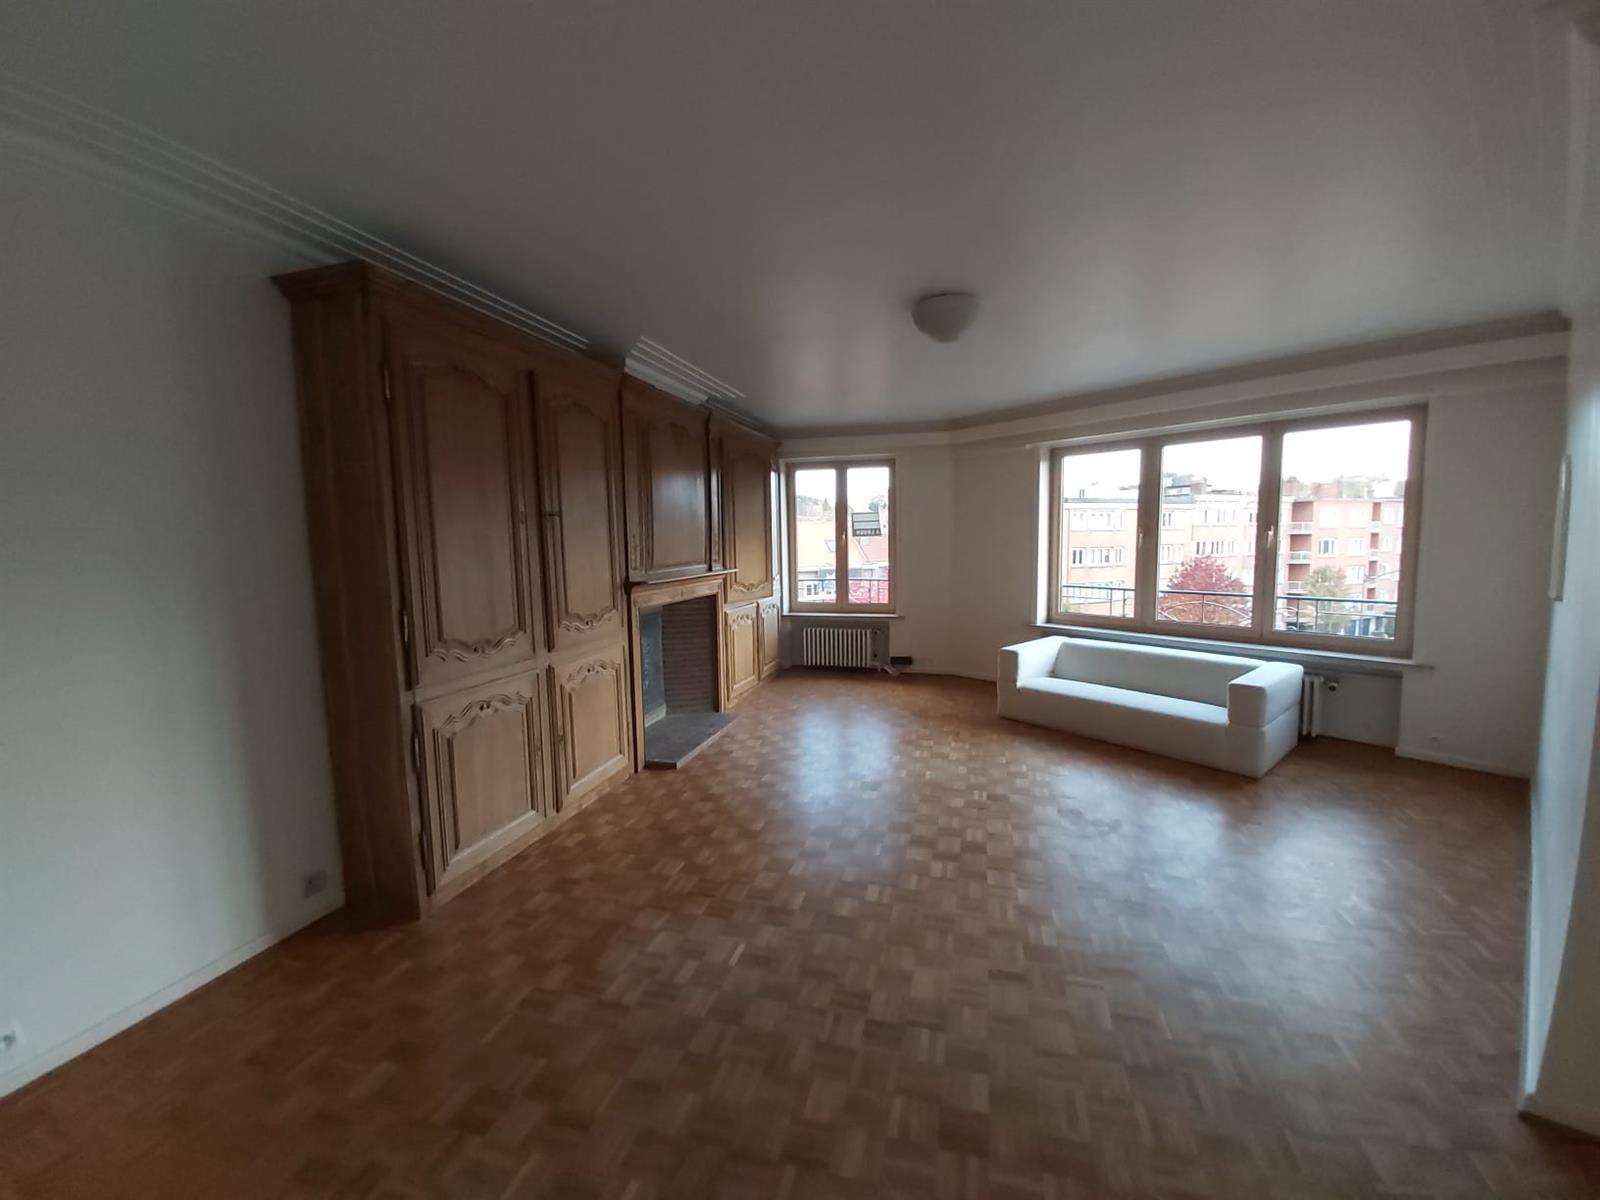 Appartement - Woluwe-Saint-Lambert - #4174735-1